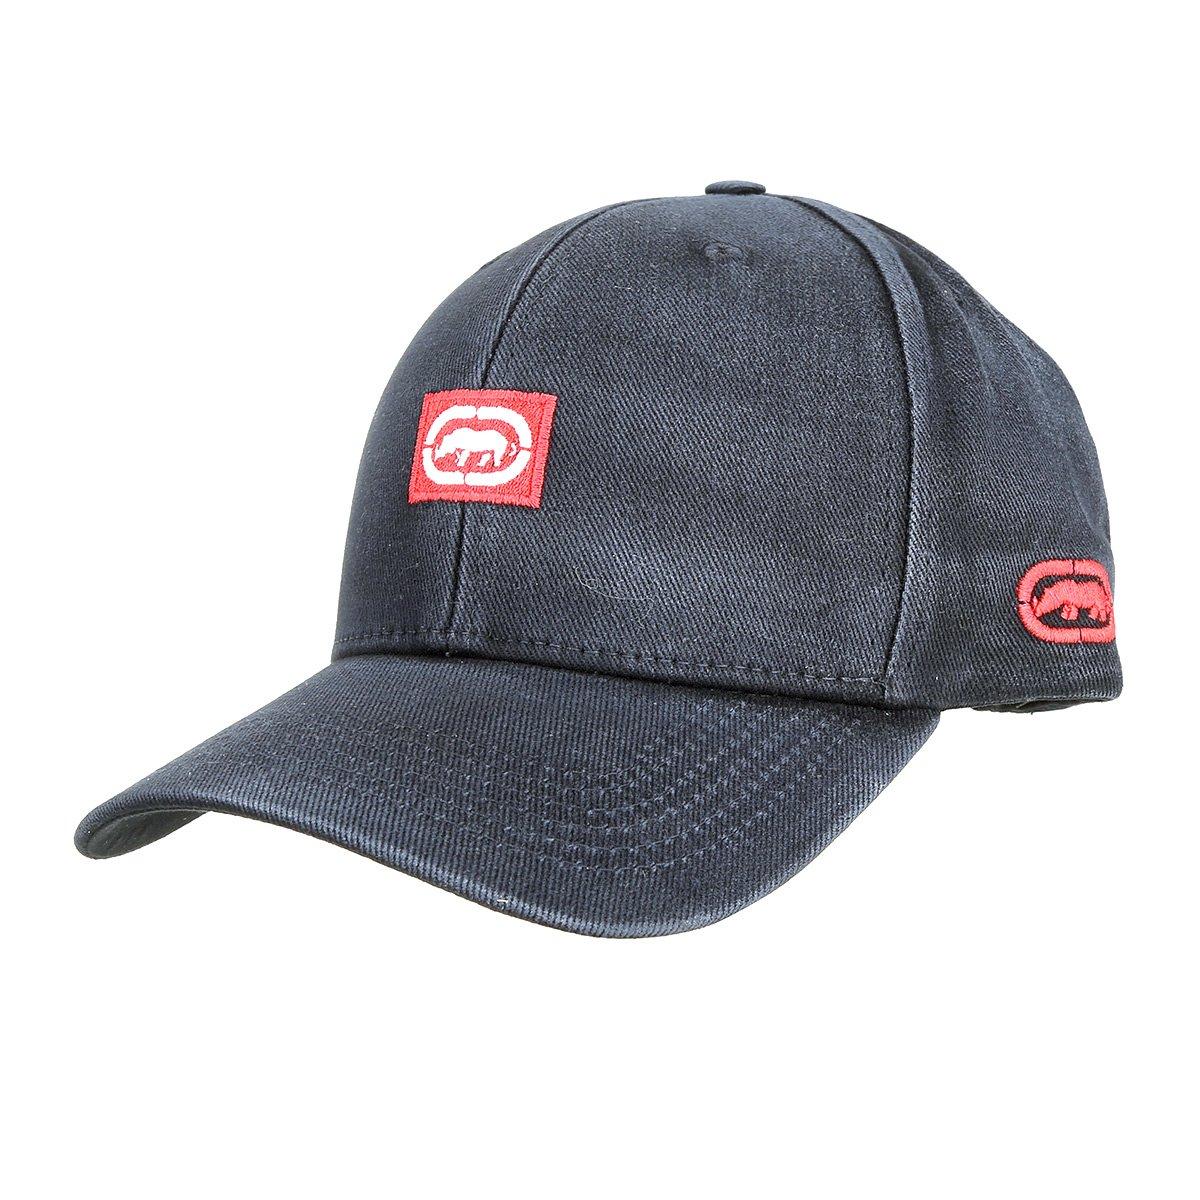 163936852bc052  Boné Ecko Aba Curva Jeans Mini Badge Masculino - Compre  Agora Netshoes 216817cffdc182 ... ba18dc66fb